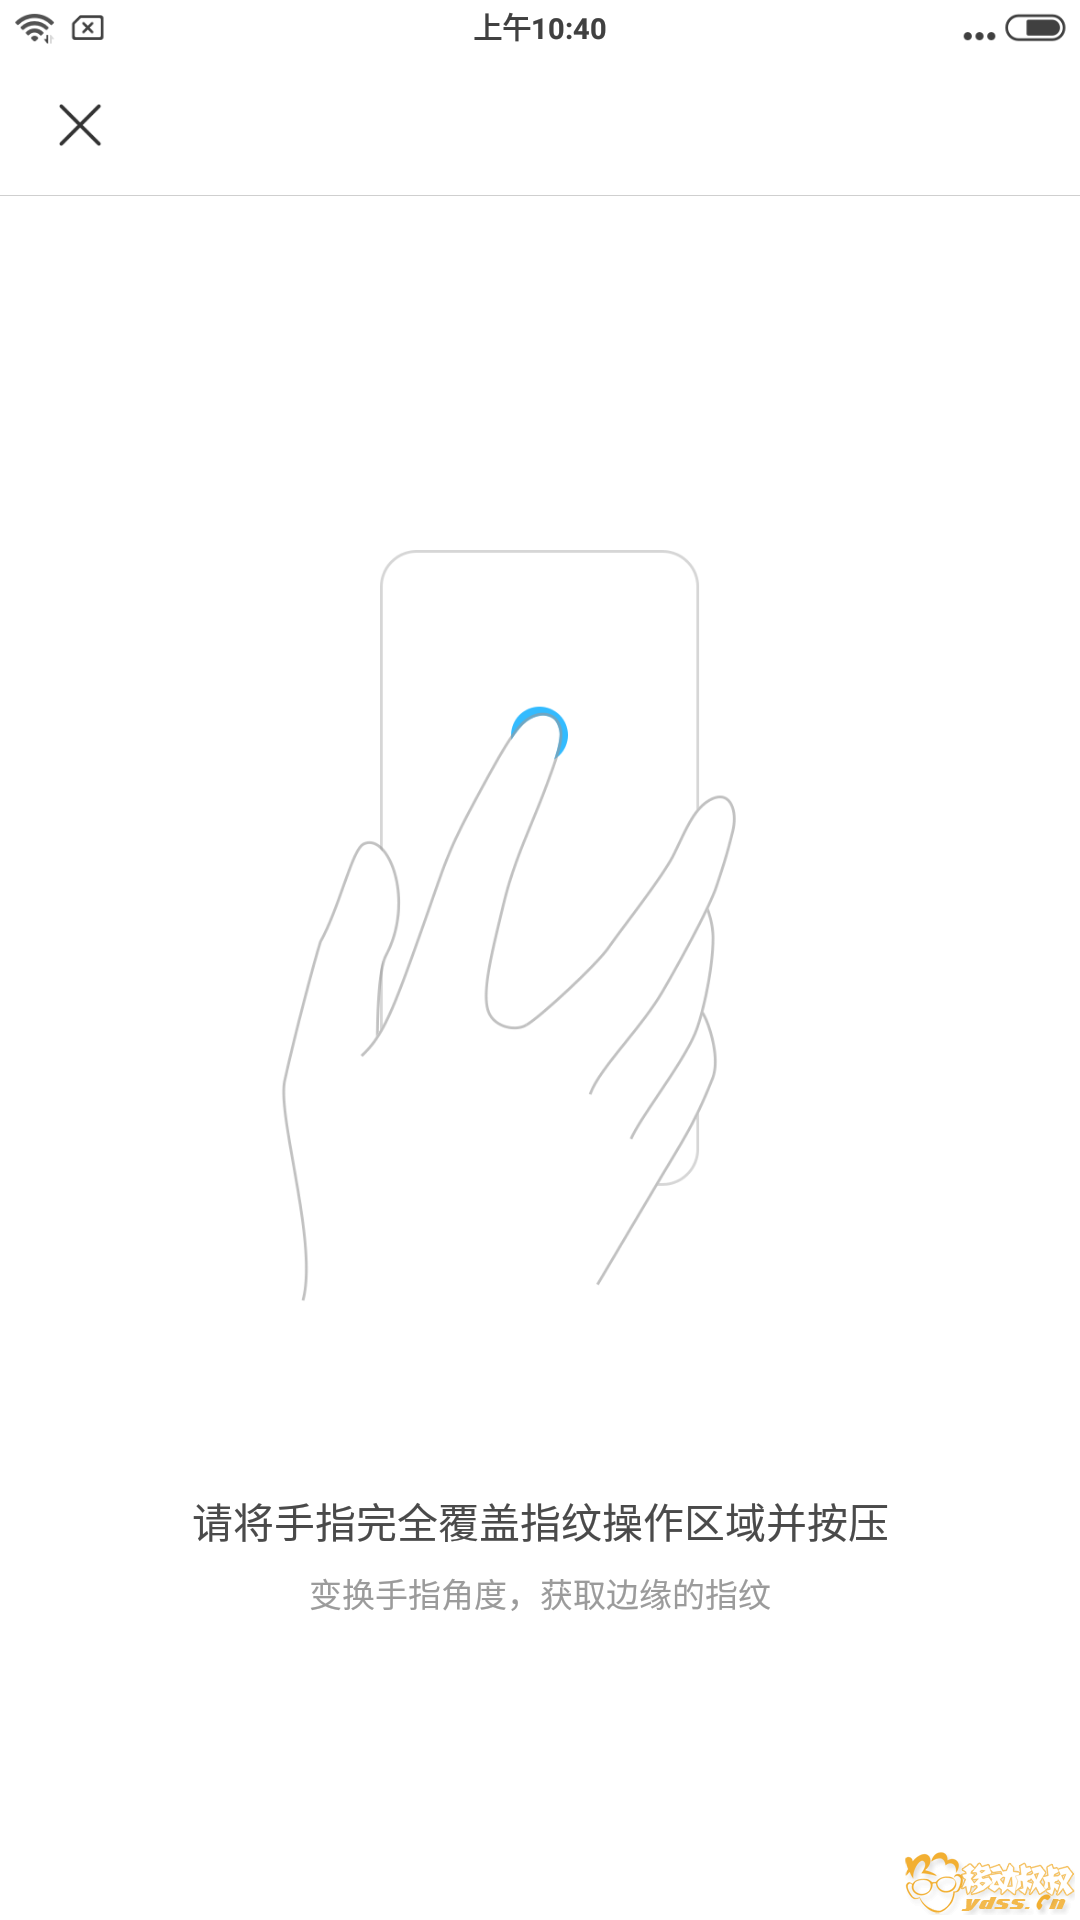 Screenshot_2018-08-10-10-40-36-837_com.android.settings.png